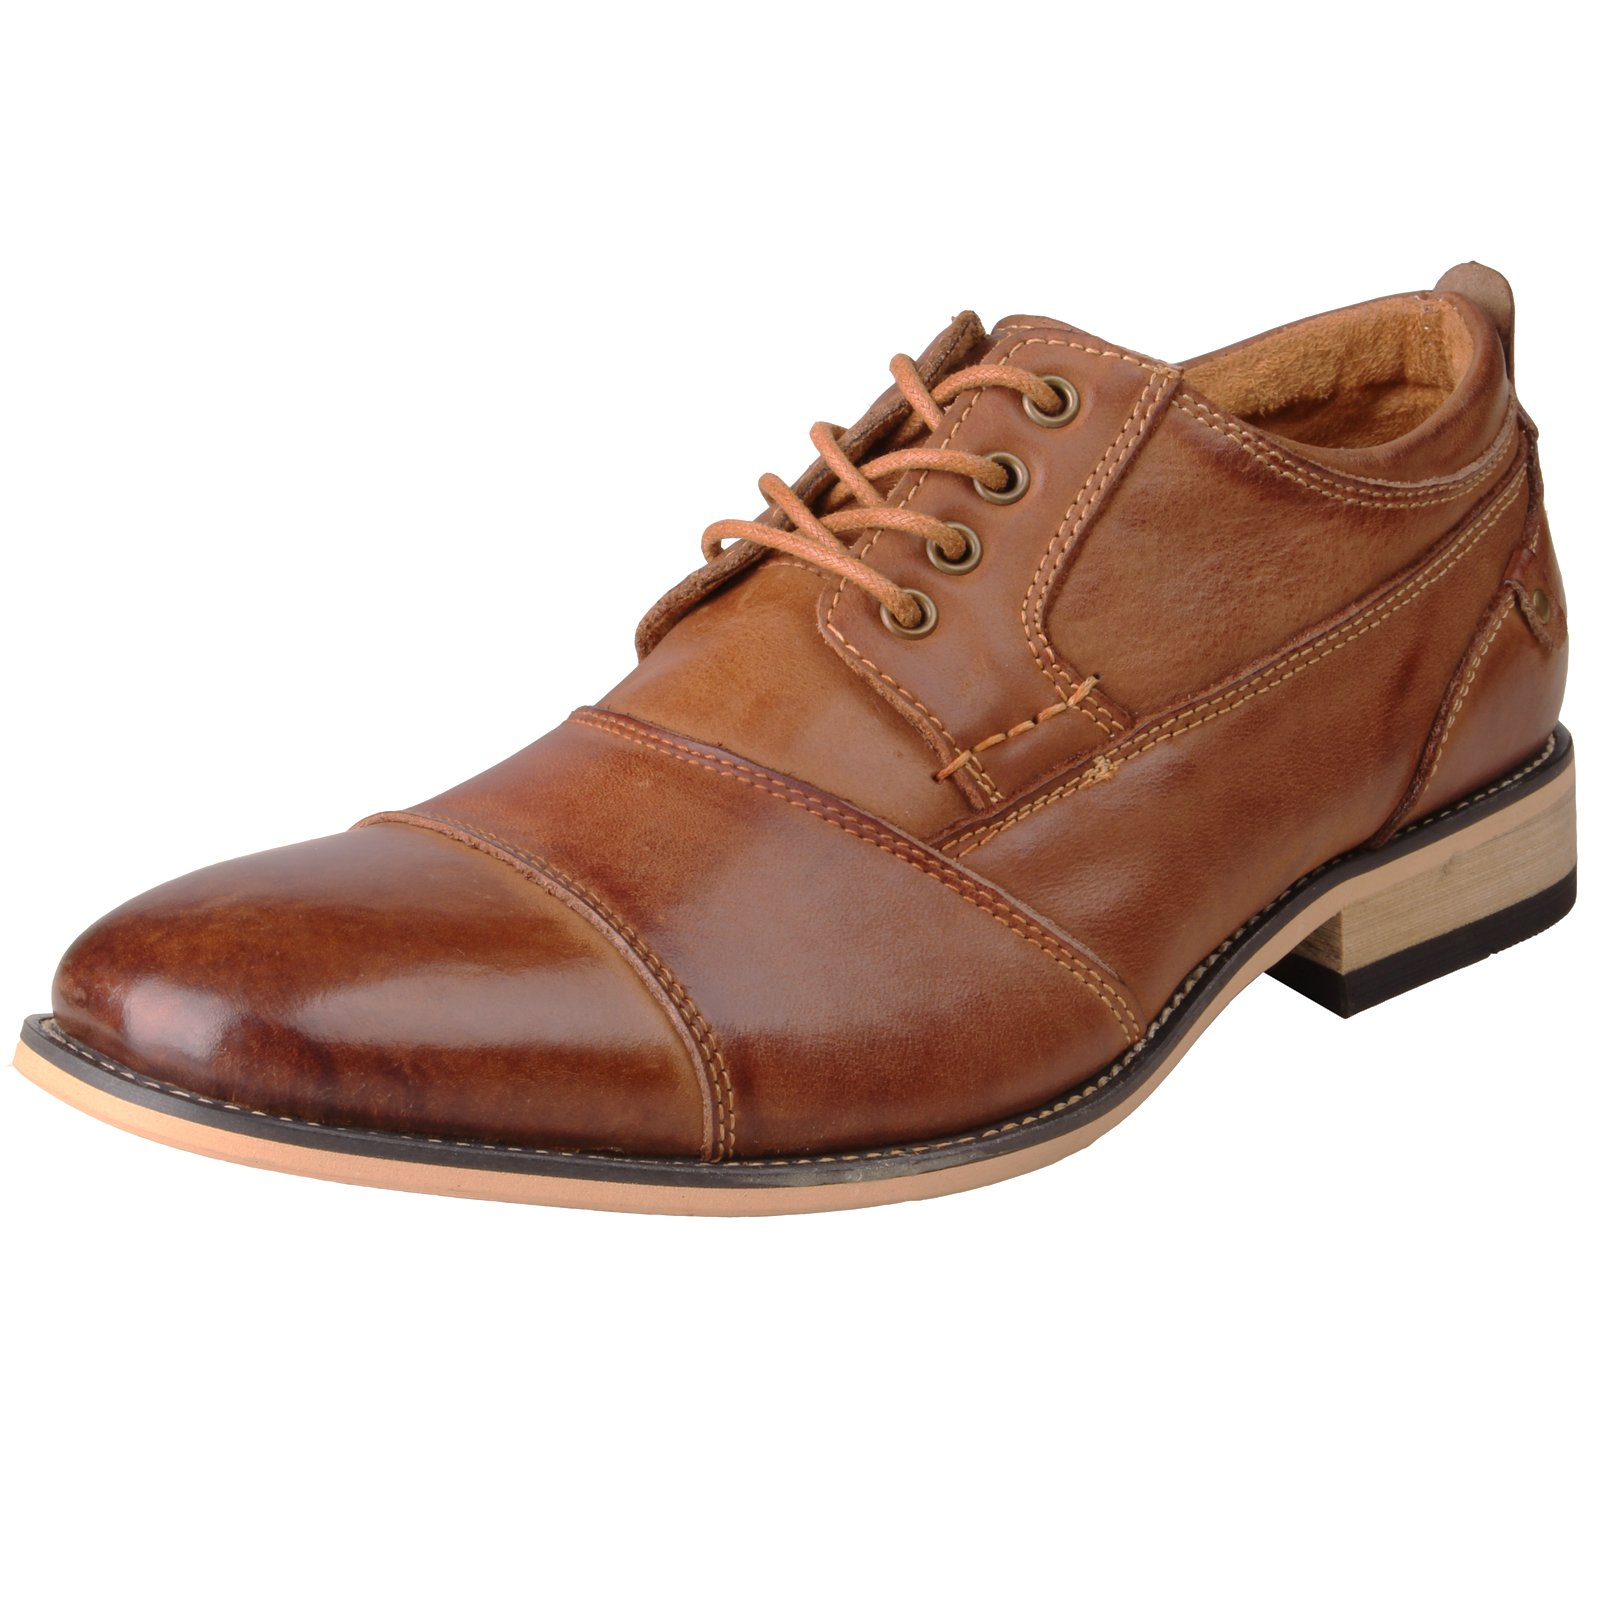 Kunsto Men's Leather Cap Toe Oxford Shoes US Size 11 Brown